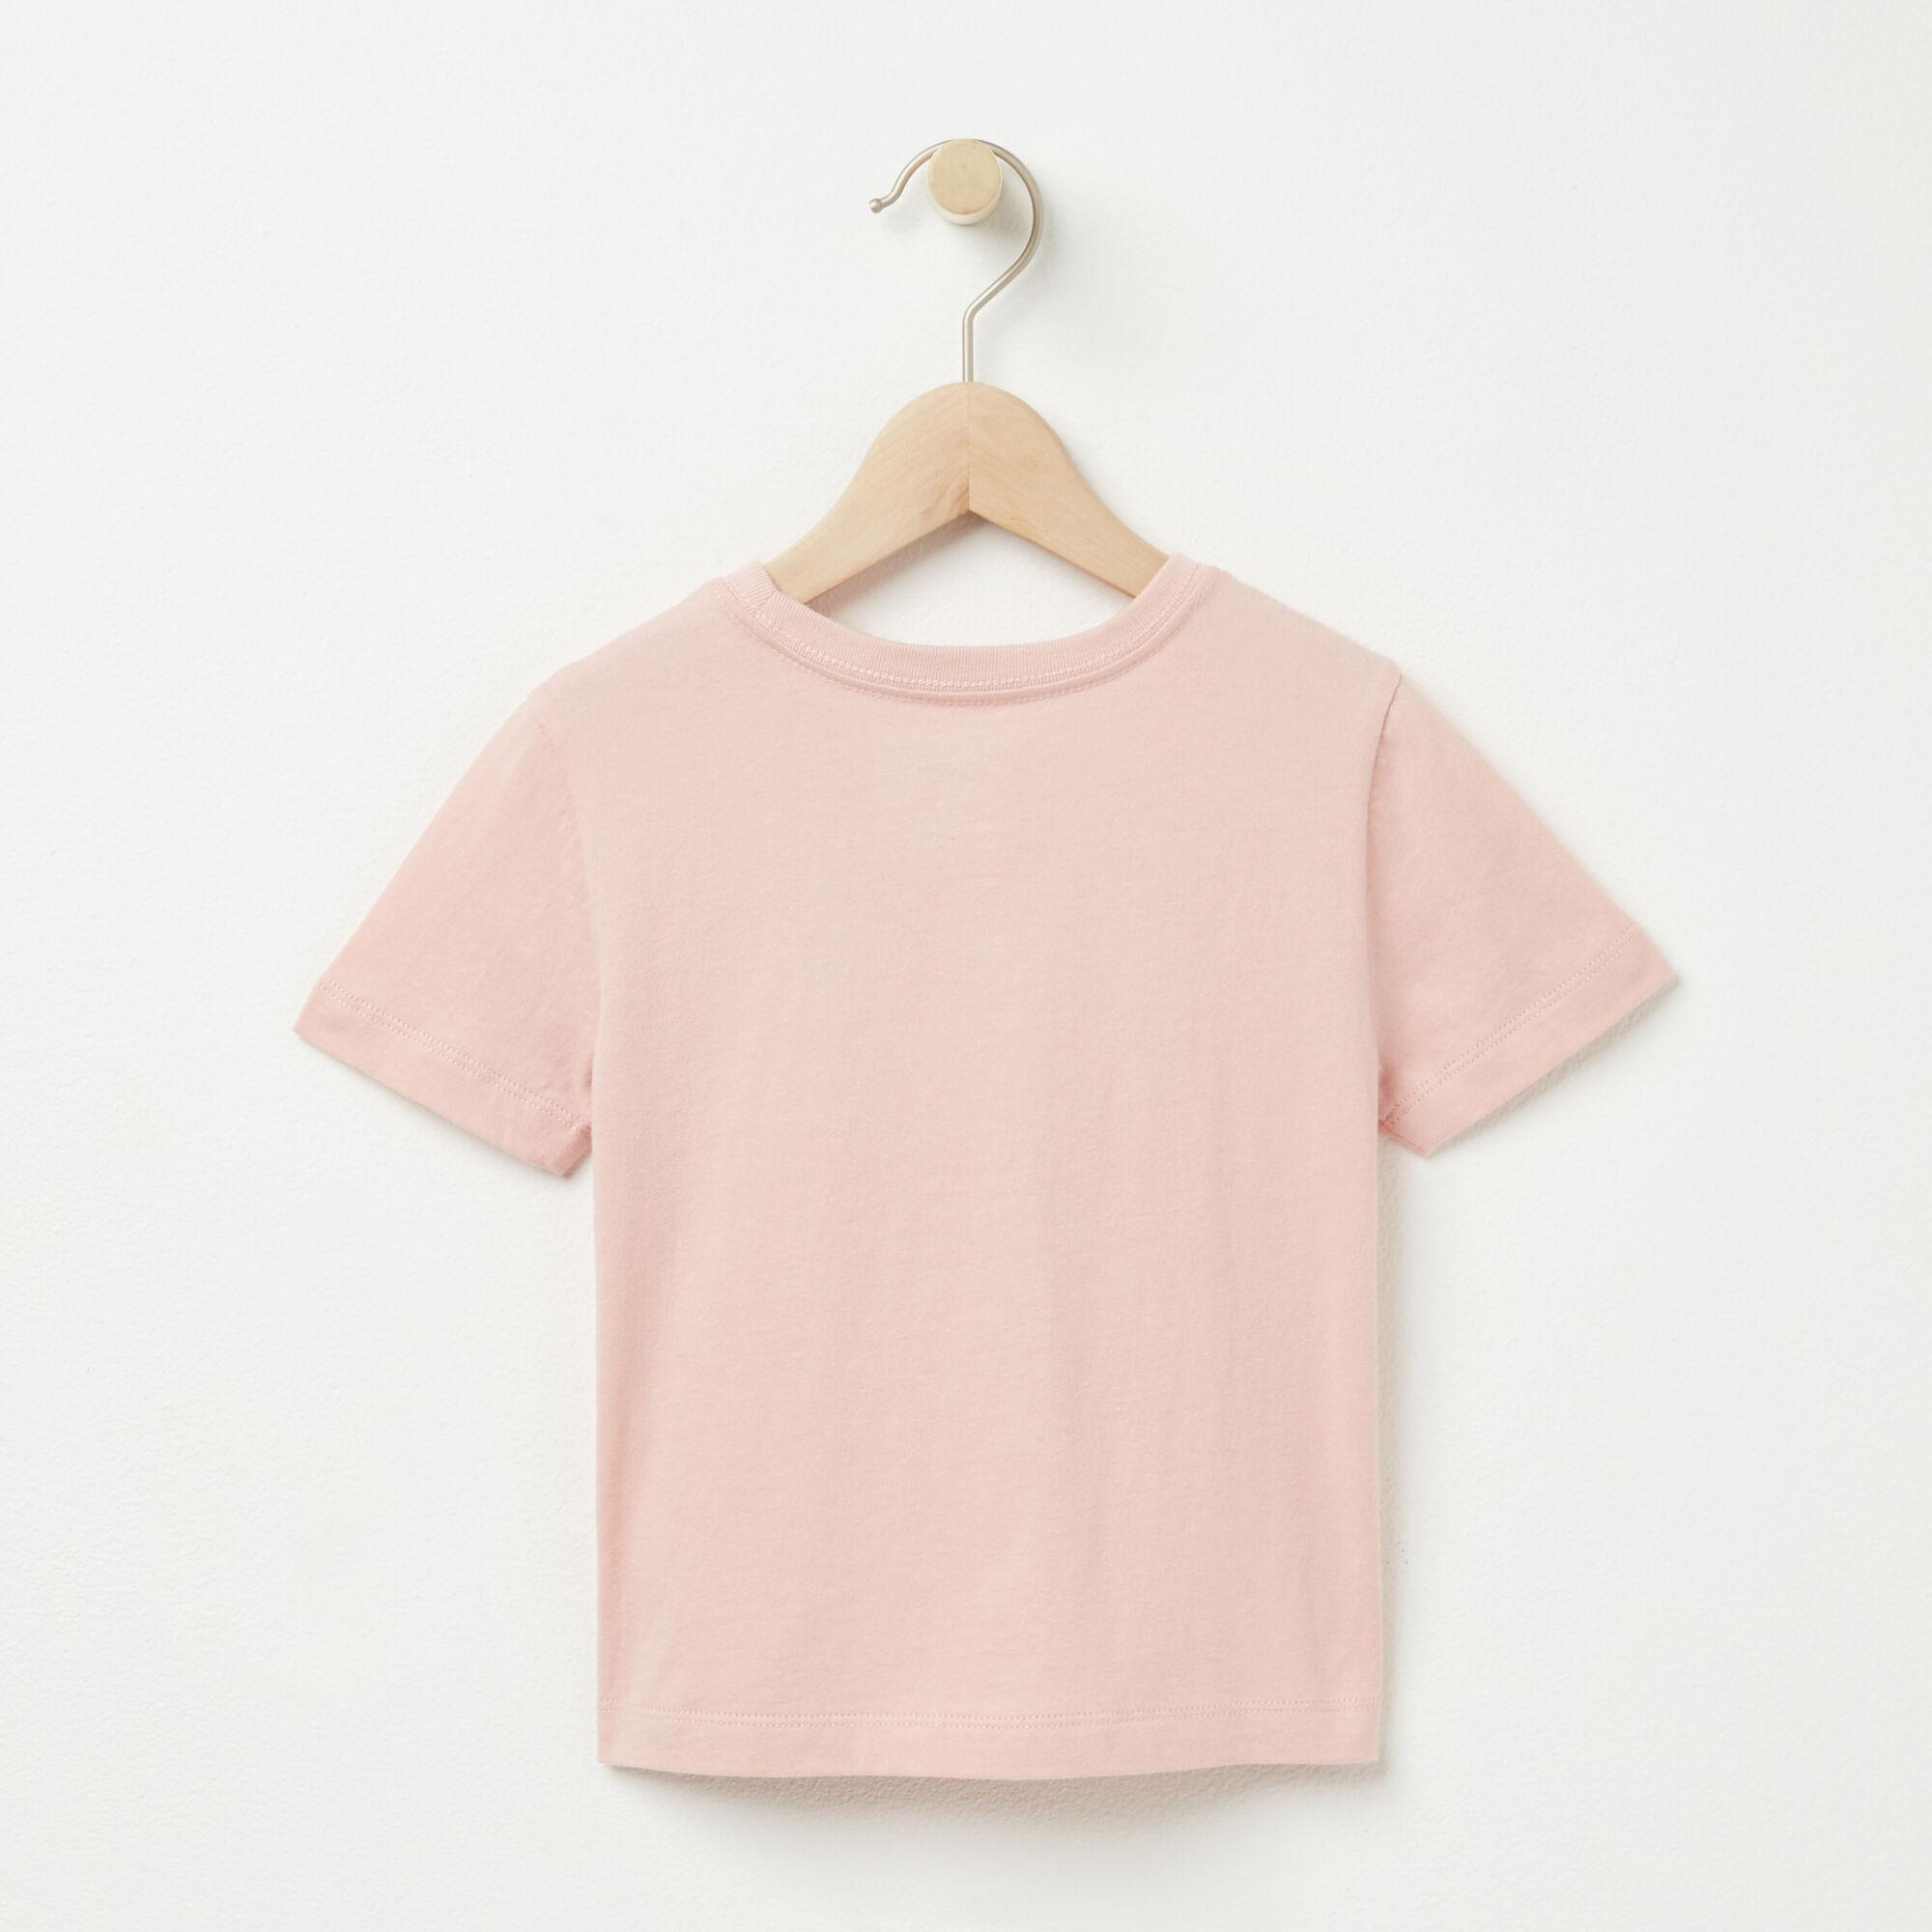 Tout-Petits T-shirt Caledonia